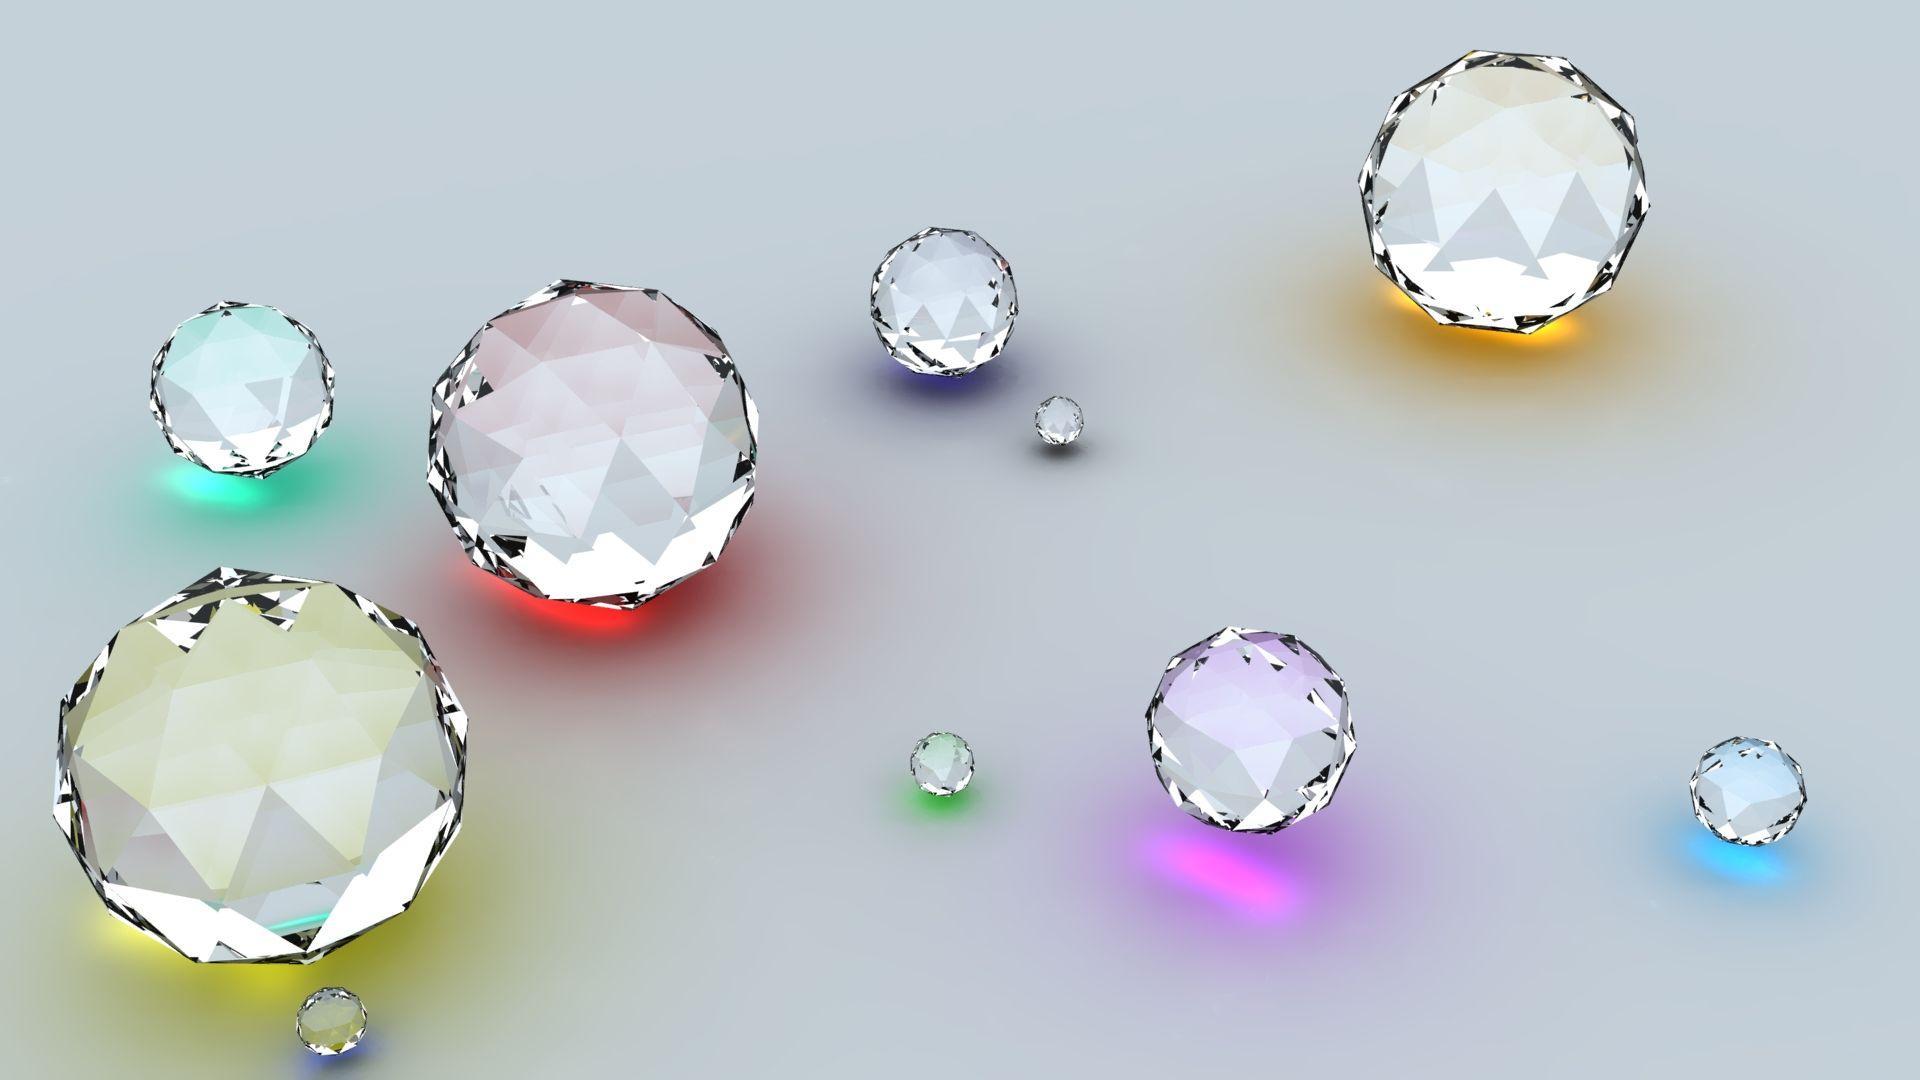 Diamonds Wallpapers Wallpaper Cave